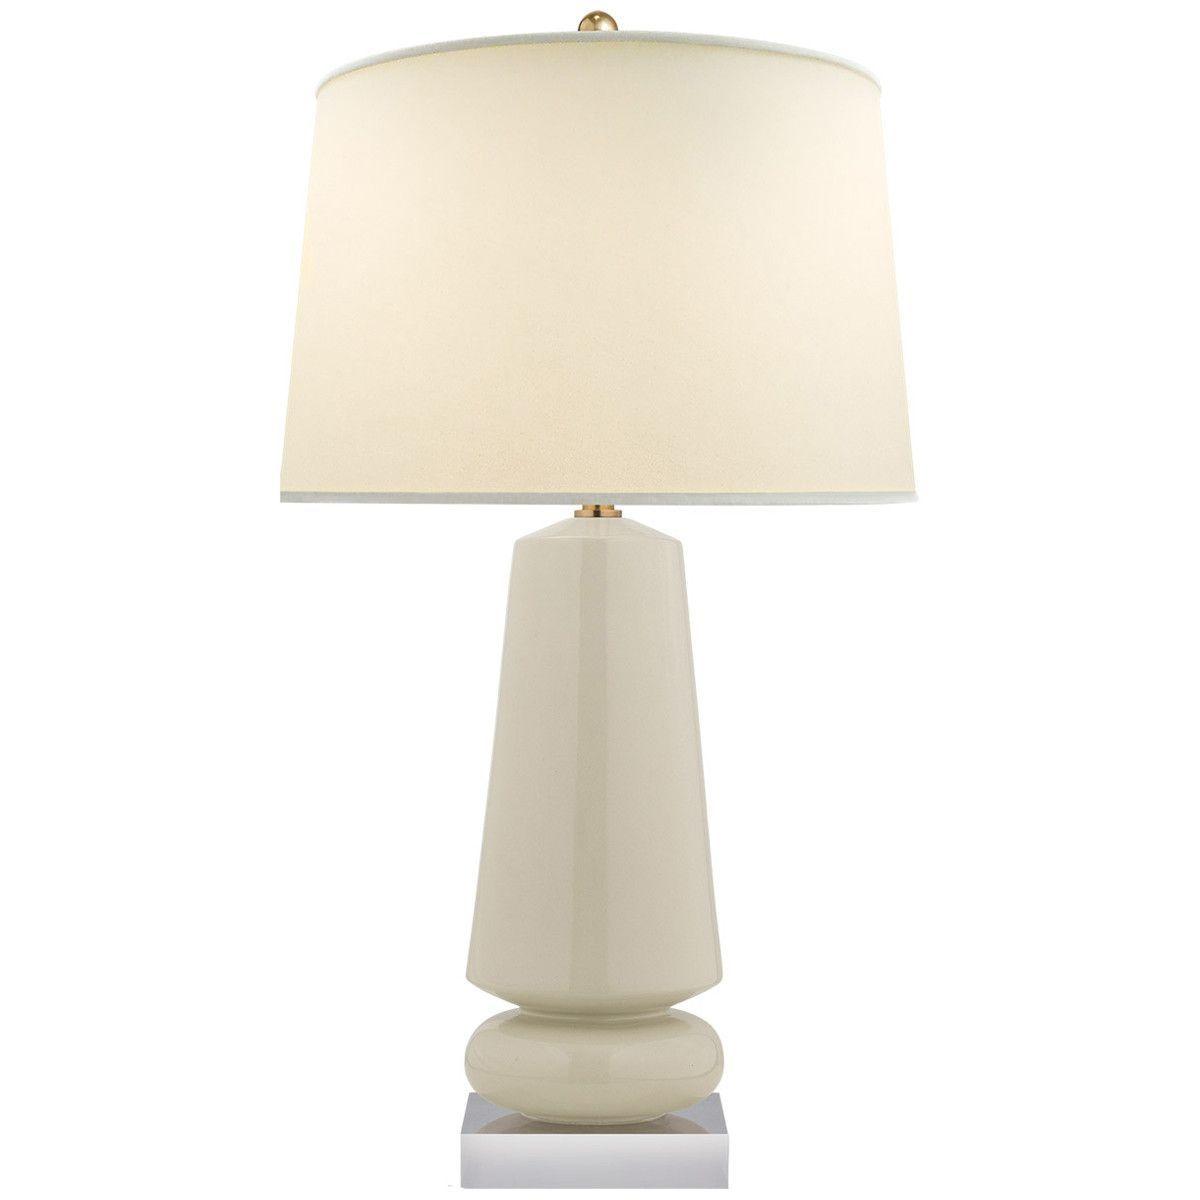 Visual Comfort Lighting E F Chapman Parisienne 35 Inch Table Lamp